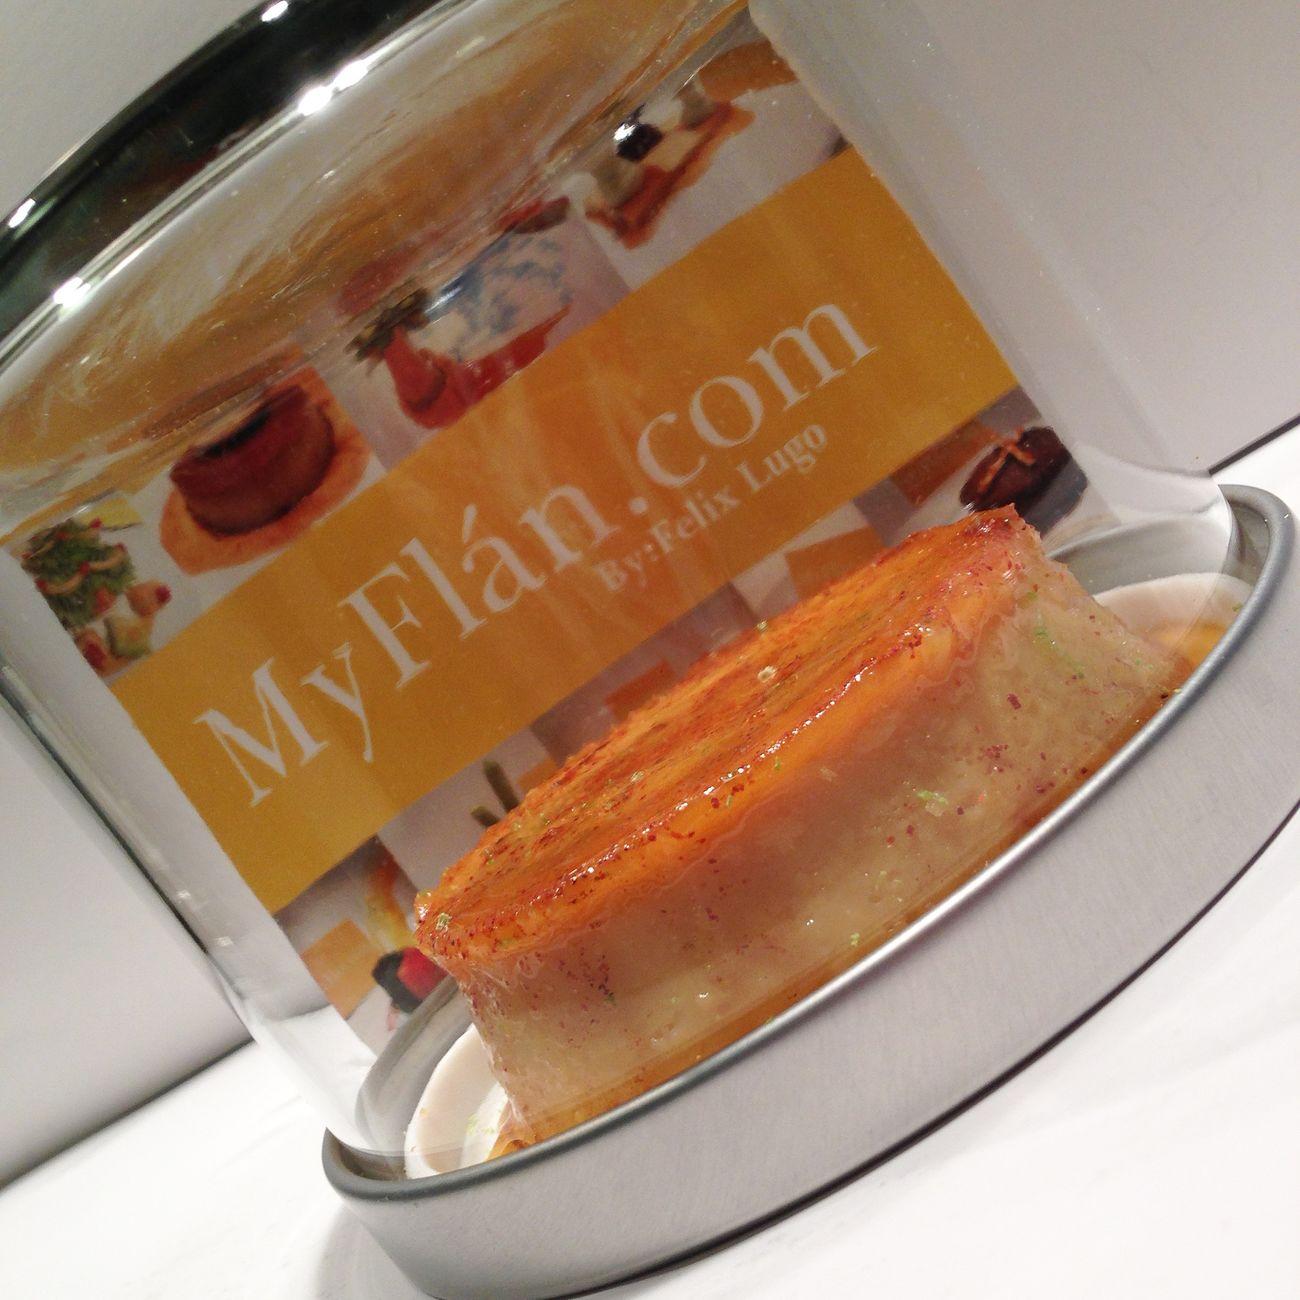 Desserts Pudim Bakery Flan Myflan Foodporn Food Glasscase Jar